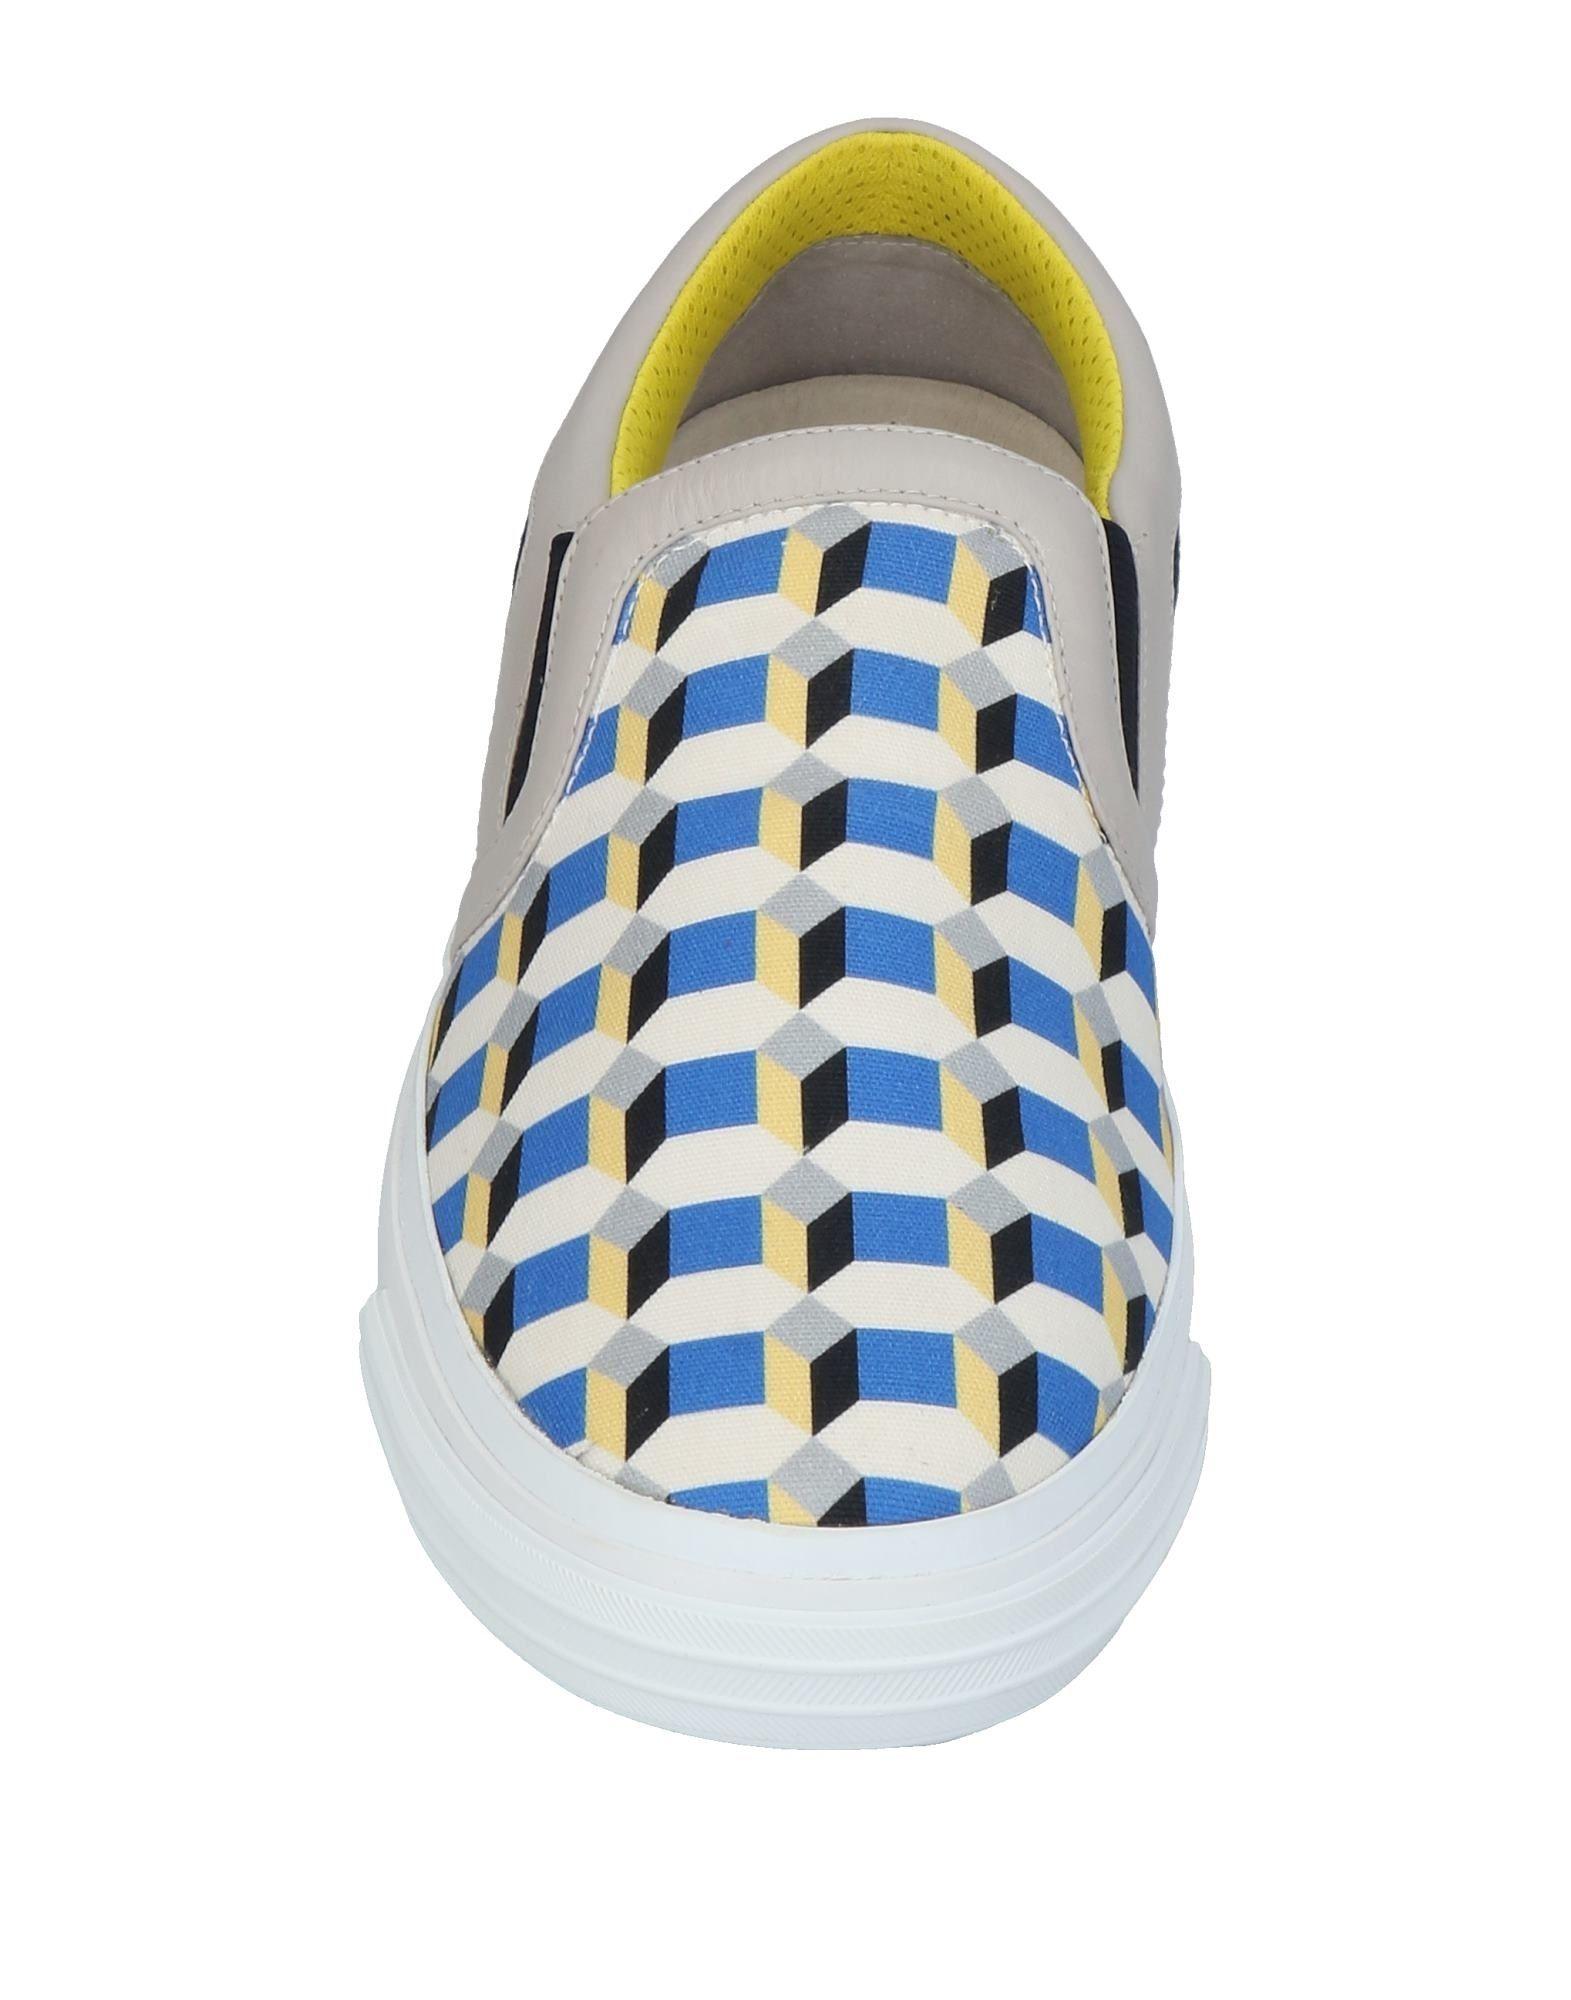 Rabatt echte Arts Schuhe Moa Master Of Arts echte Sneakers Herren  11443368DW cc5fc8